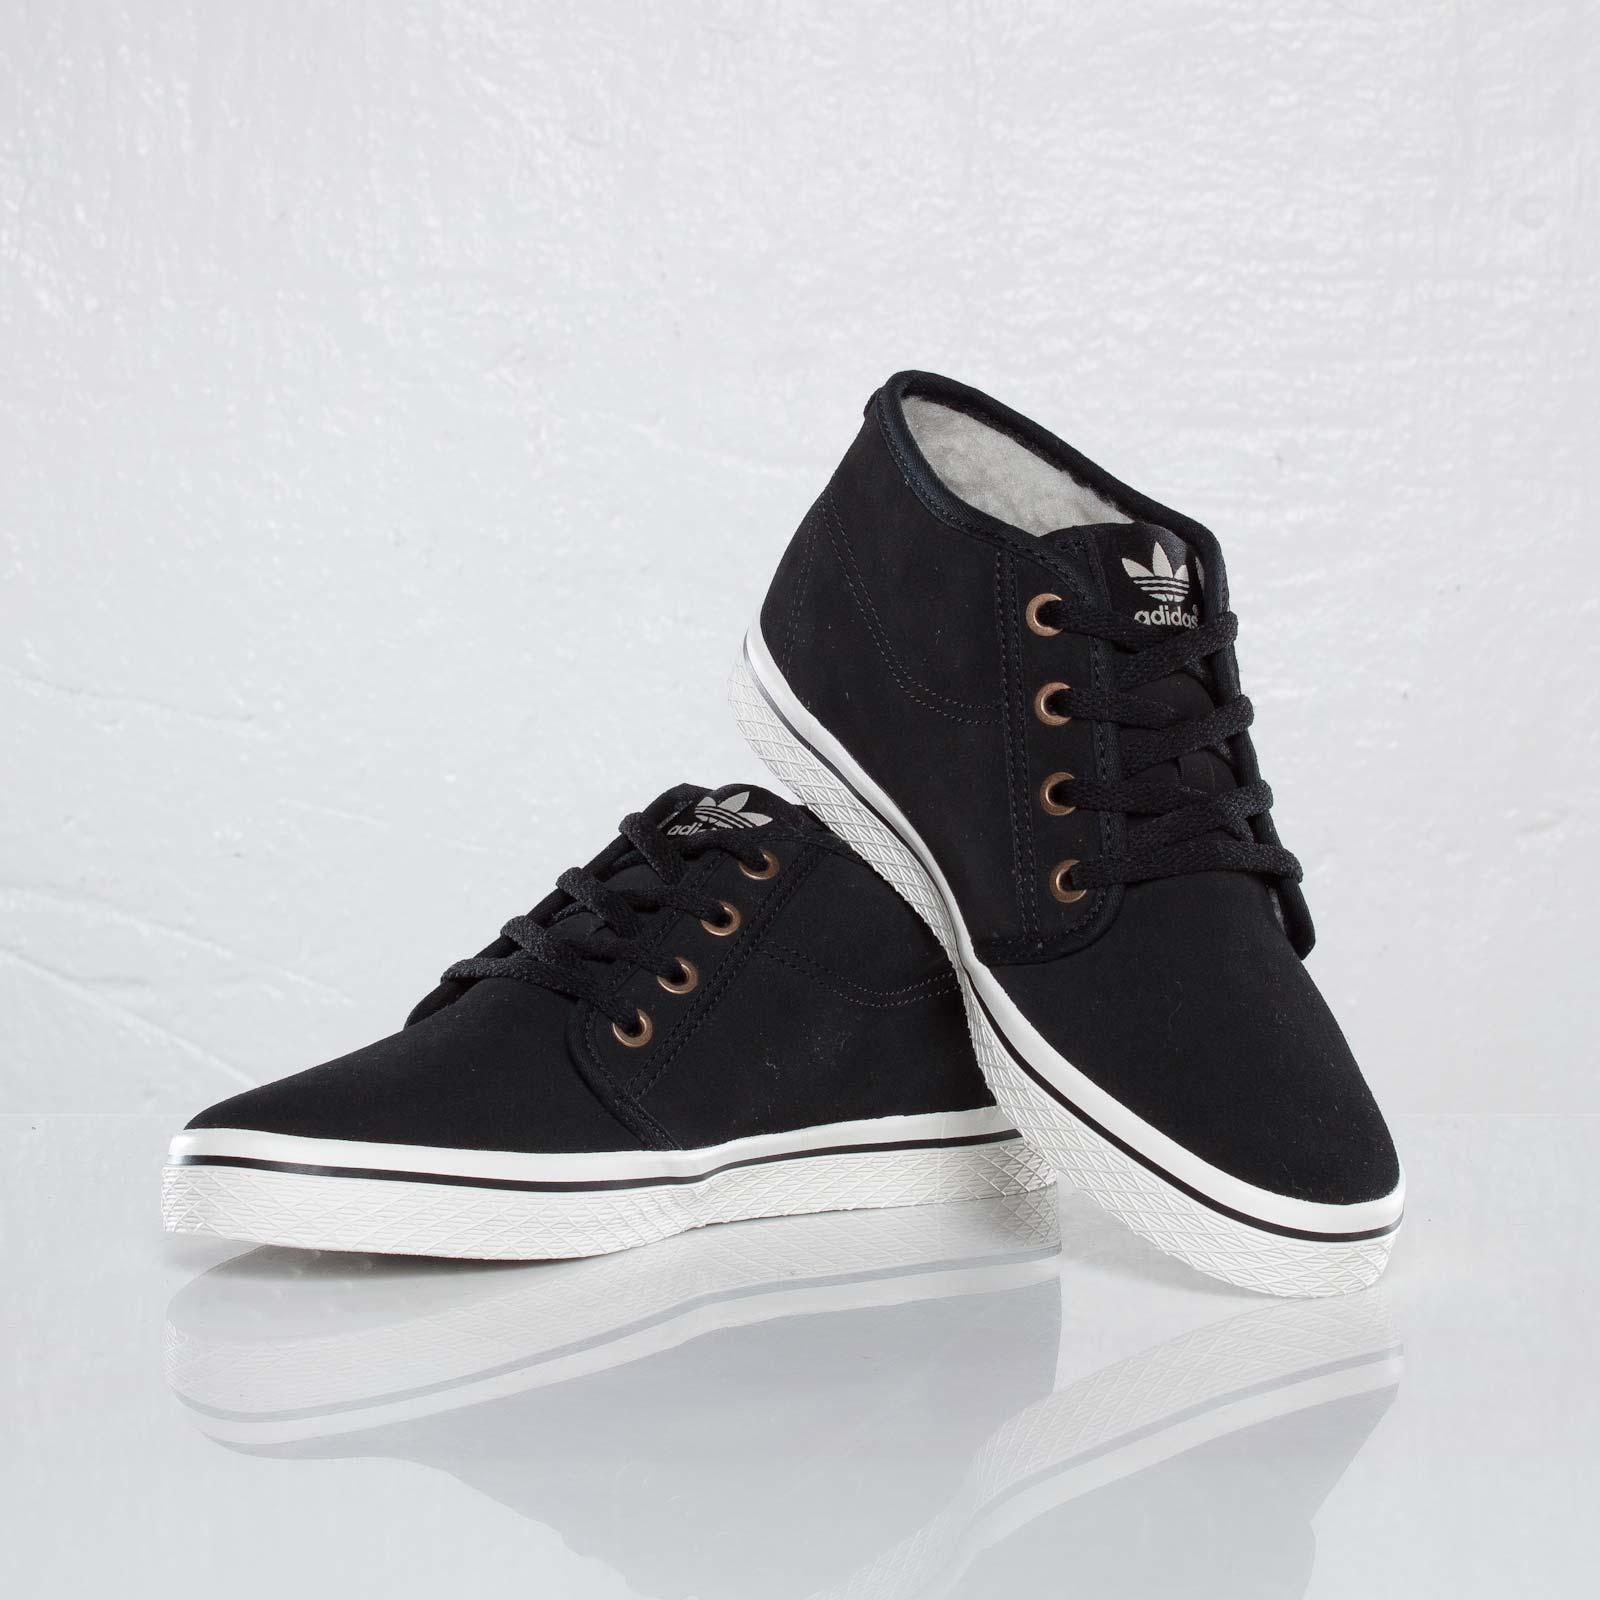 new styles 77b75 dd5c1 ... adidas honey desert